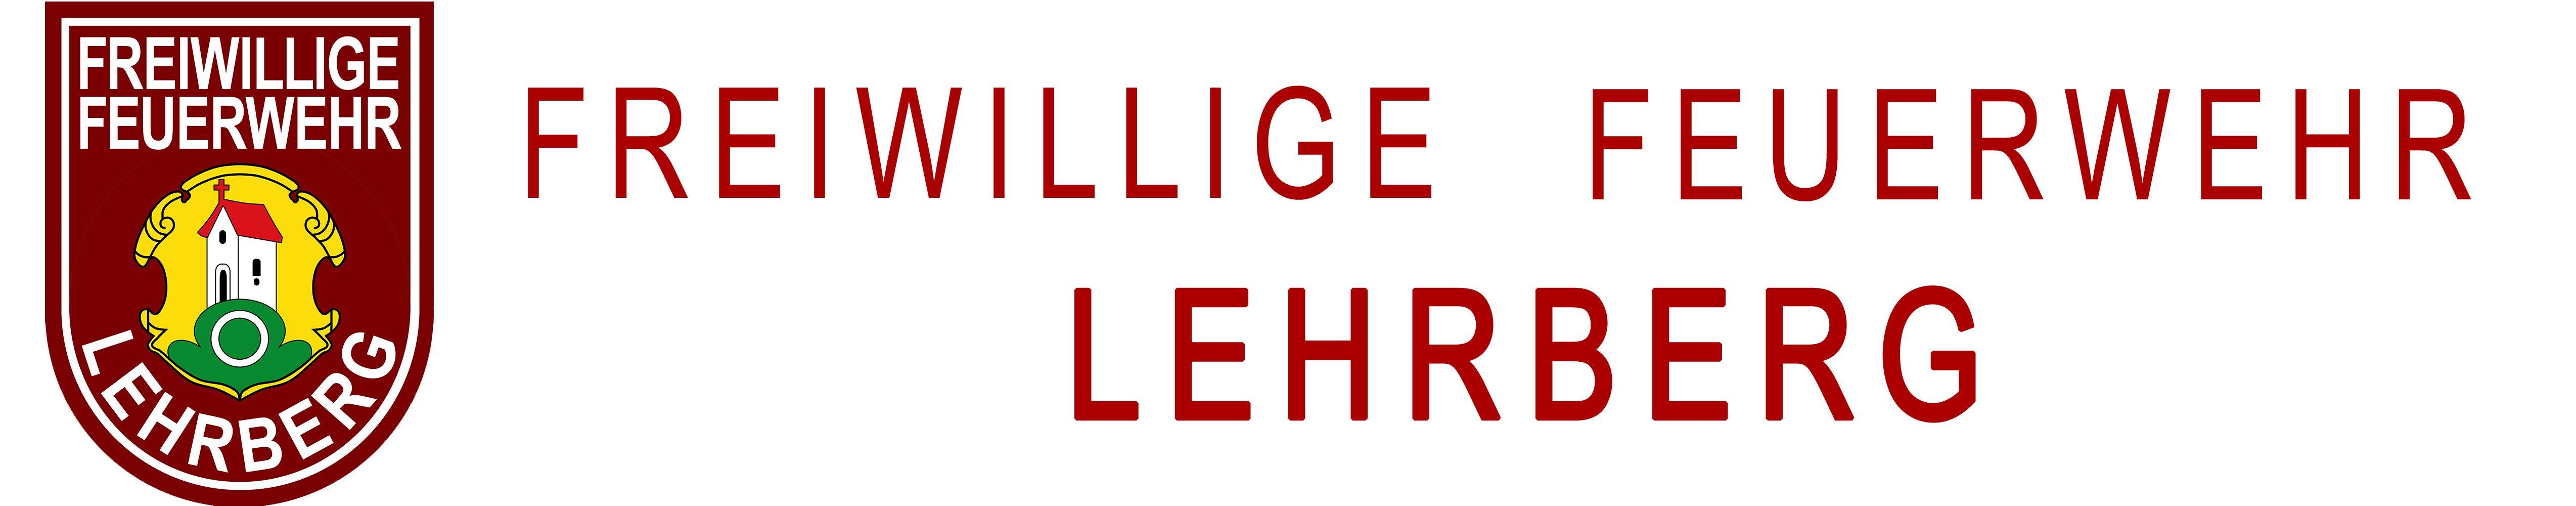 Freiwillige Feuerwehr Lehrberg